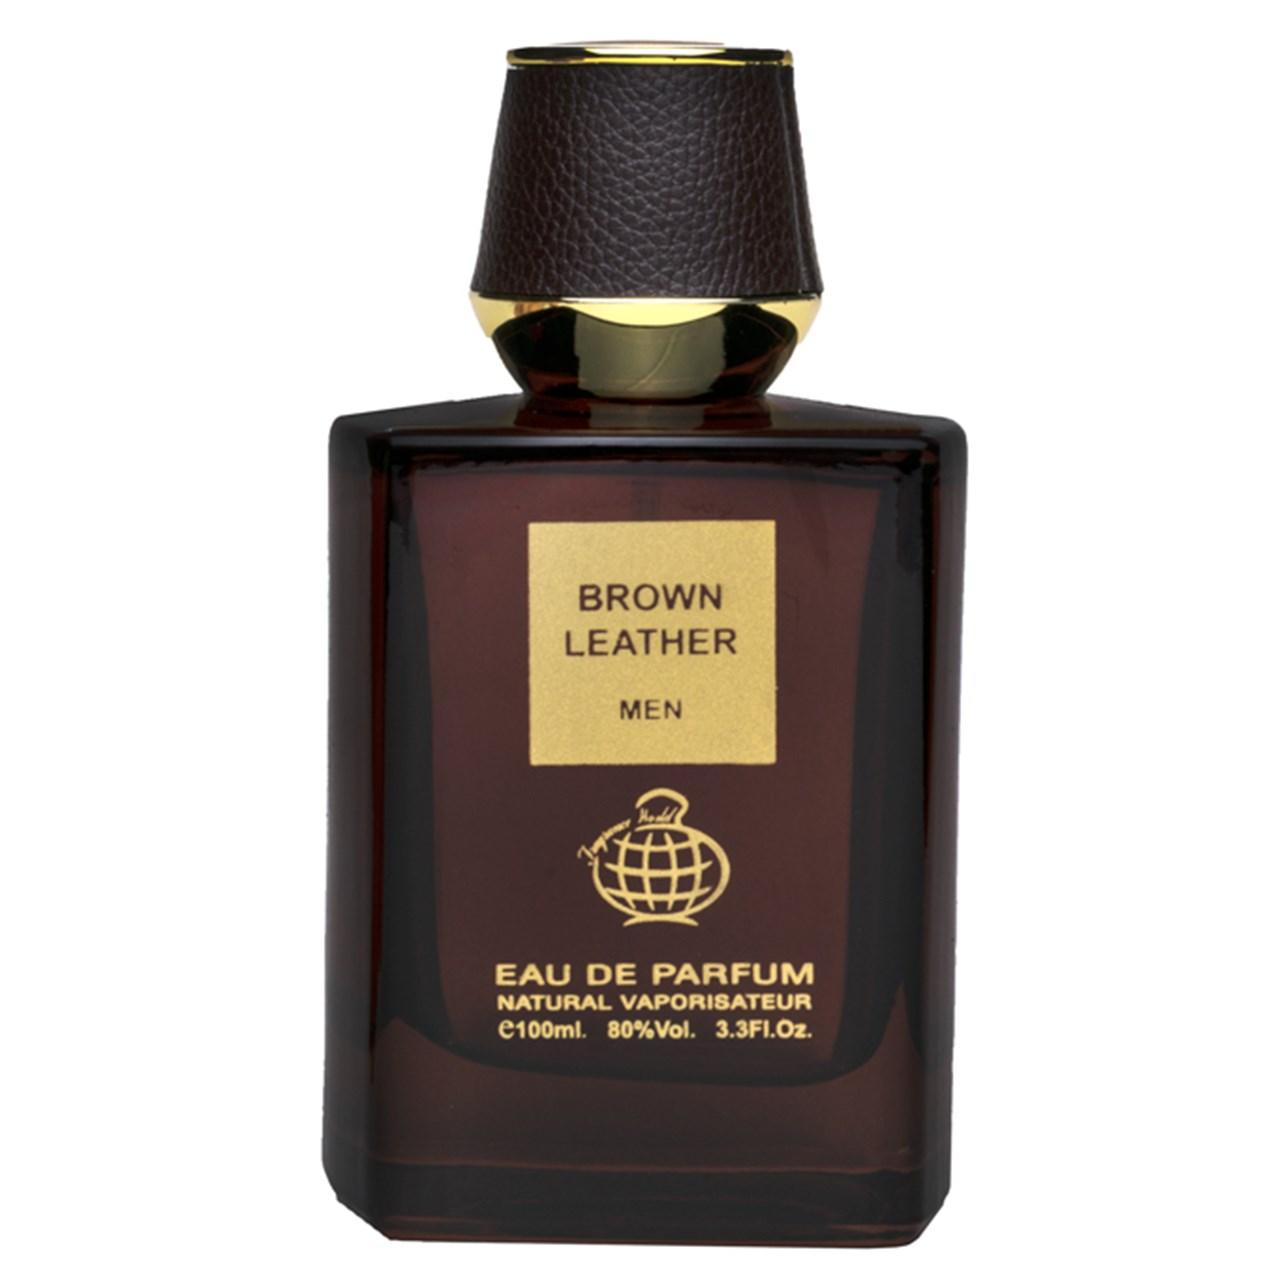 ادو پرفیوم مردانه فراگرنس ورد مدل Brown Leather حجم 100 میلی لیتر